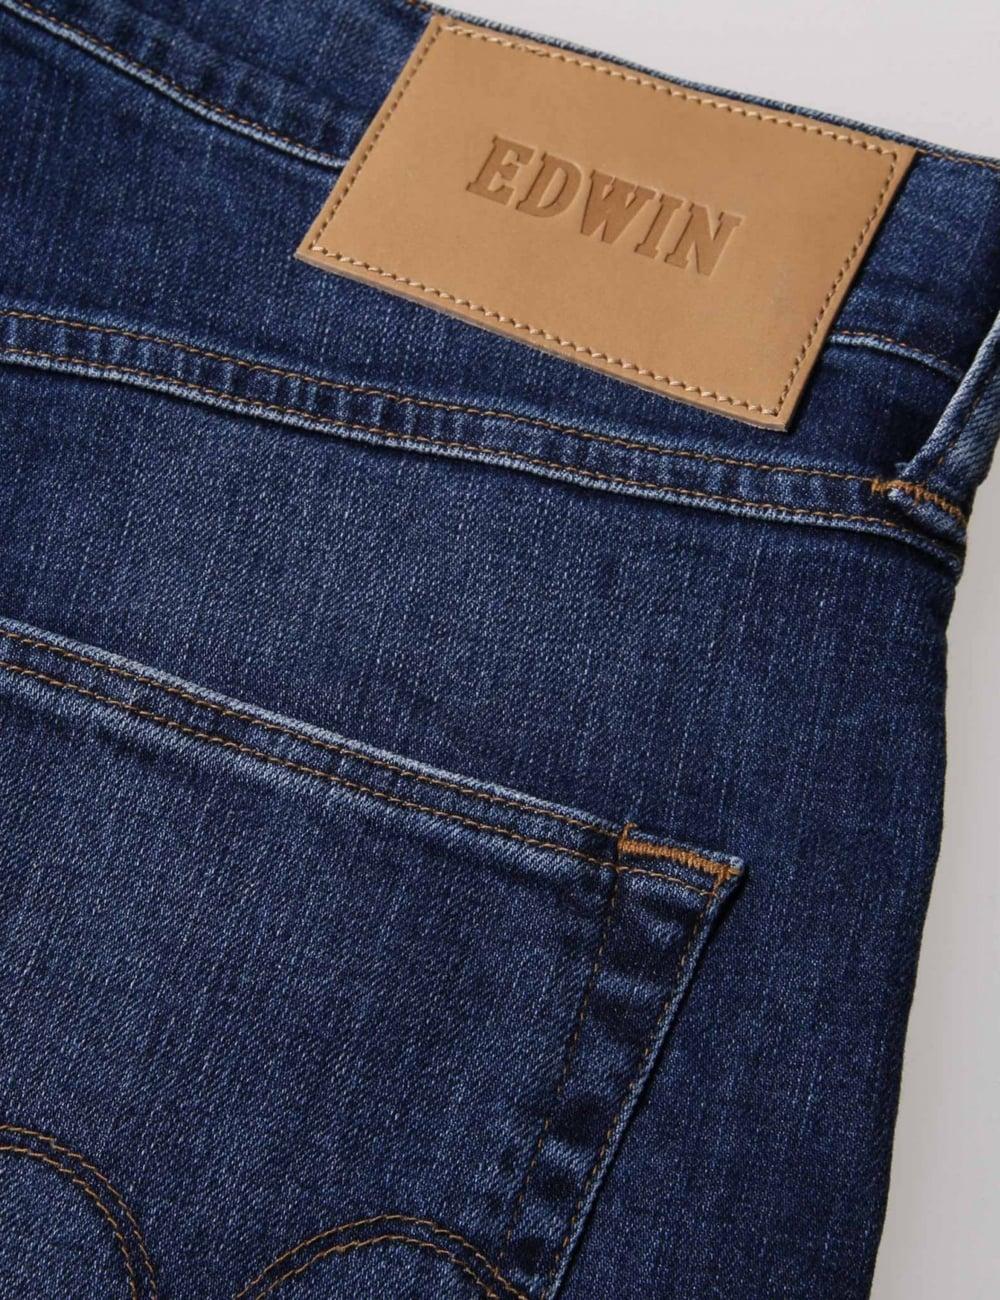 Edwin Europe ED-55 Relaxed Tapered 11oz Listed Dark Blue CS Night Blue Denim